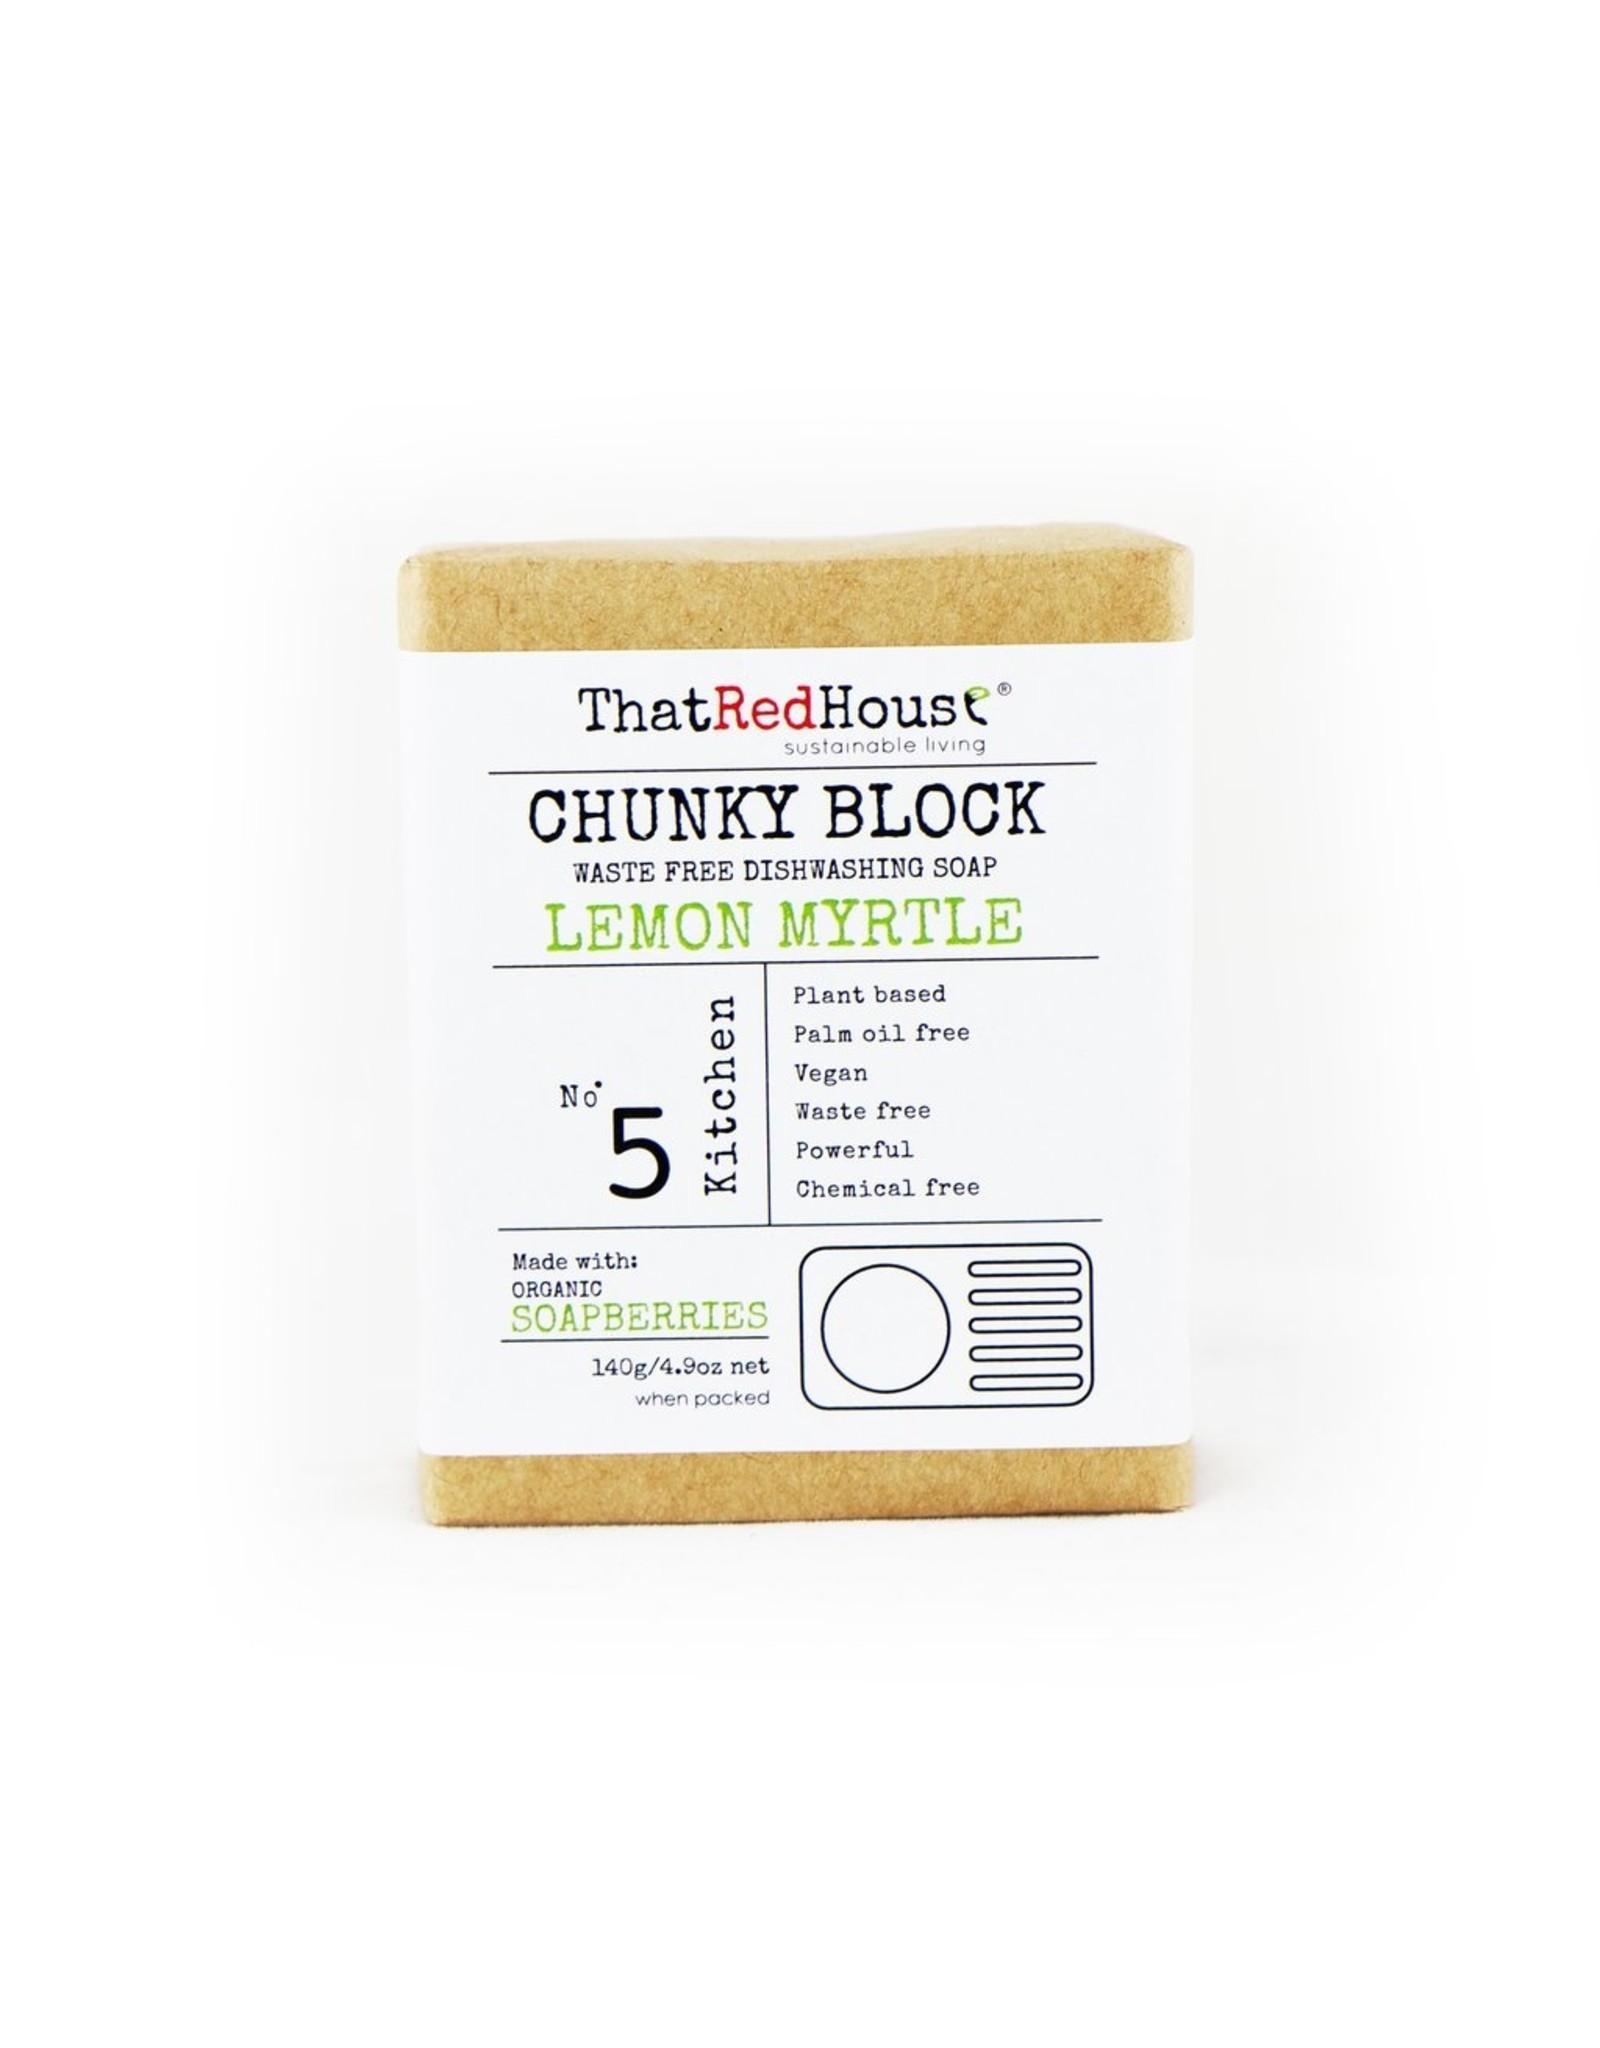 That Red House Chunky Block Lemon Myrtle Household Soap